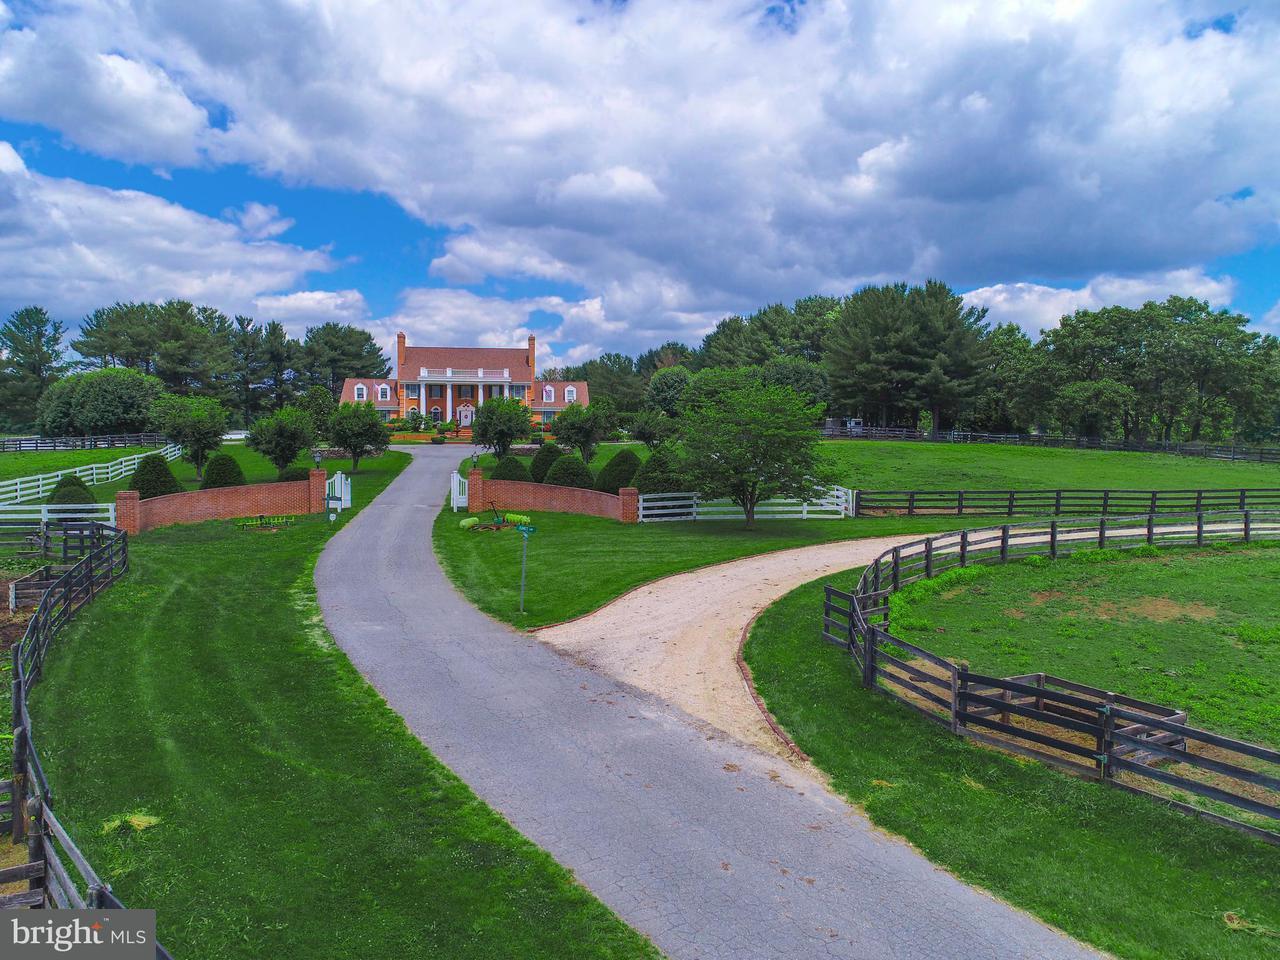 Fazenda / Quinta para Venda às 4309 Sundown Road 4309 Sundown Road Gaithersburg, Maryland 20882 Estados Unidos